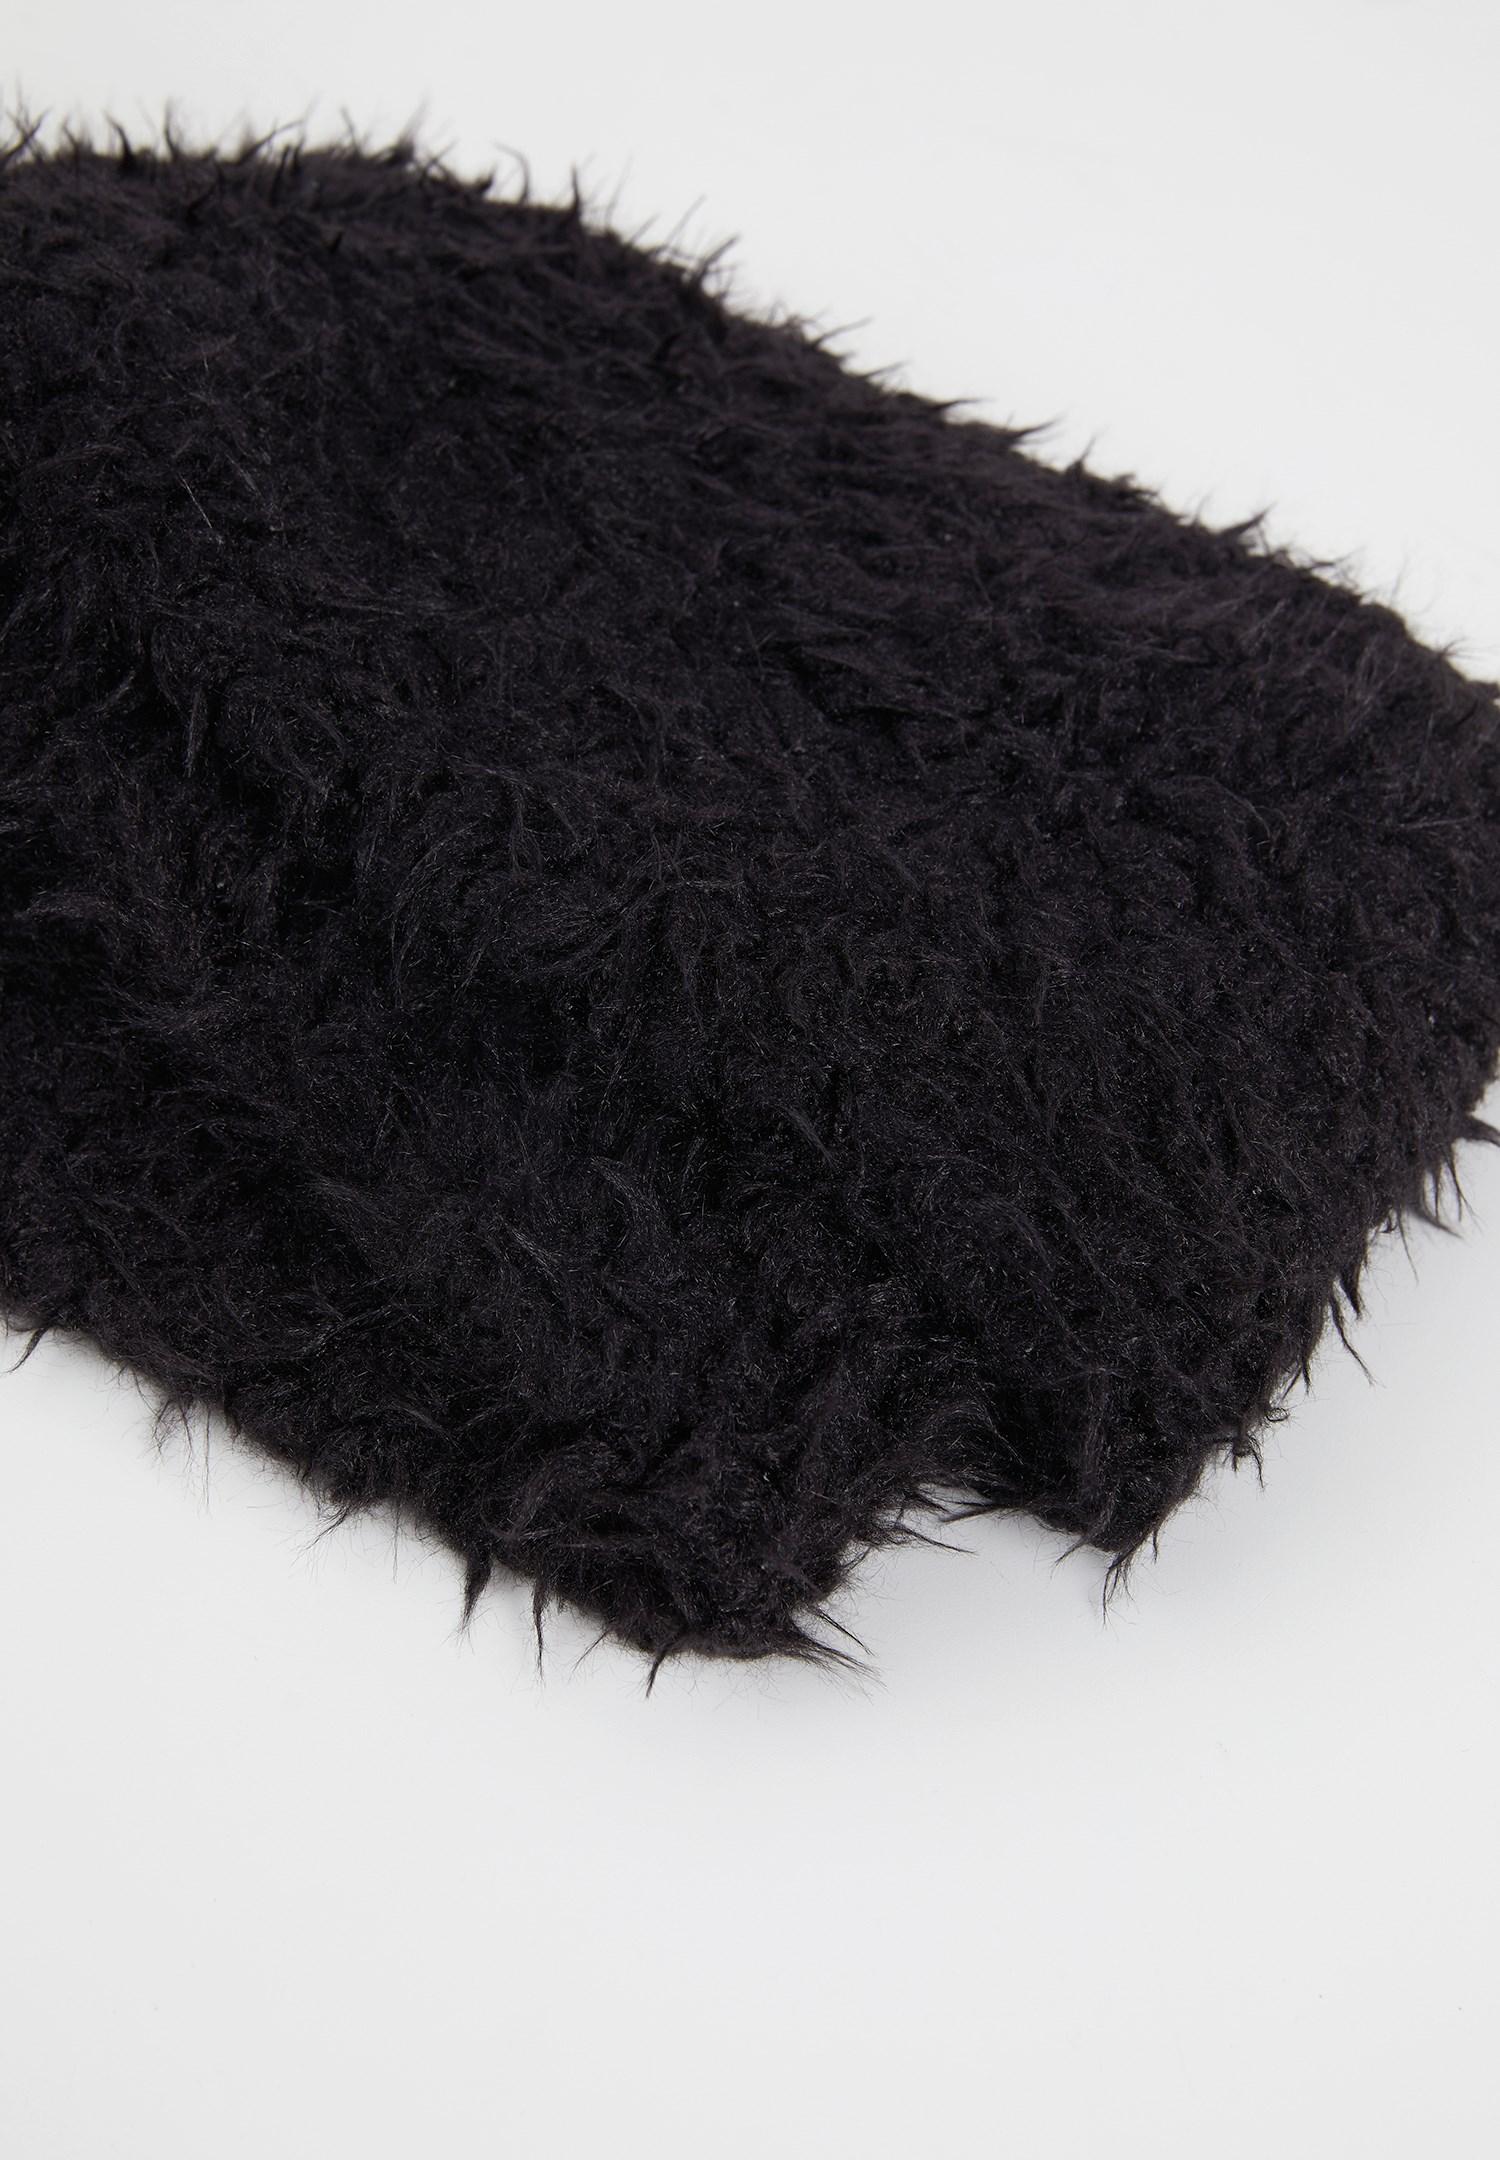 Bayan Siyah Suni Kürklü Boyunluk